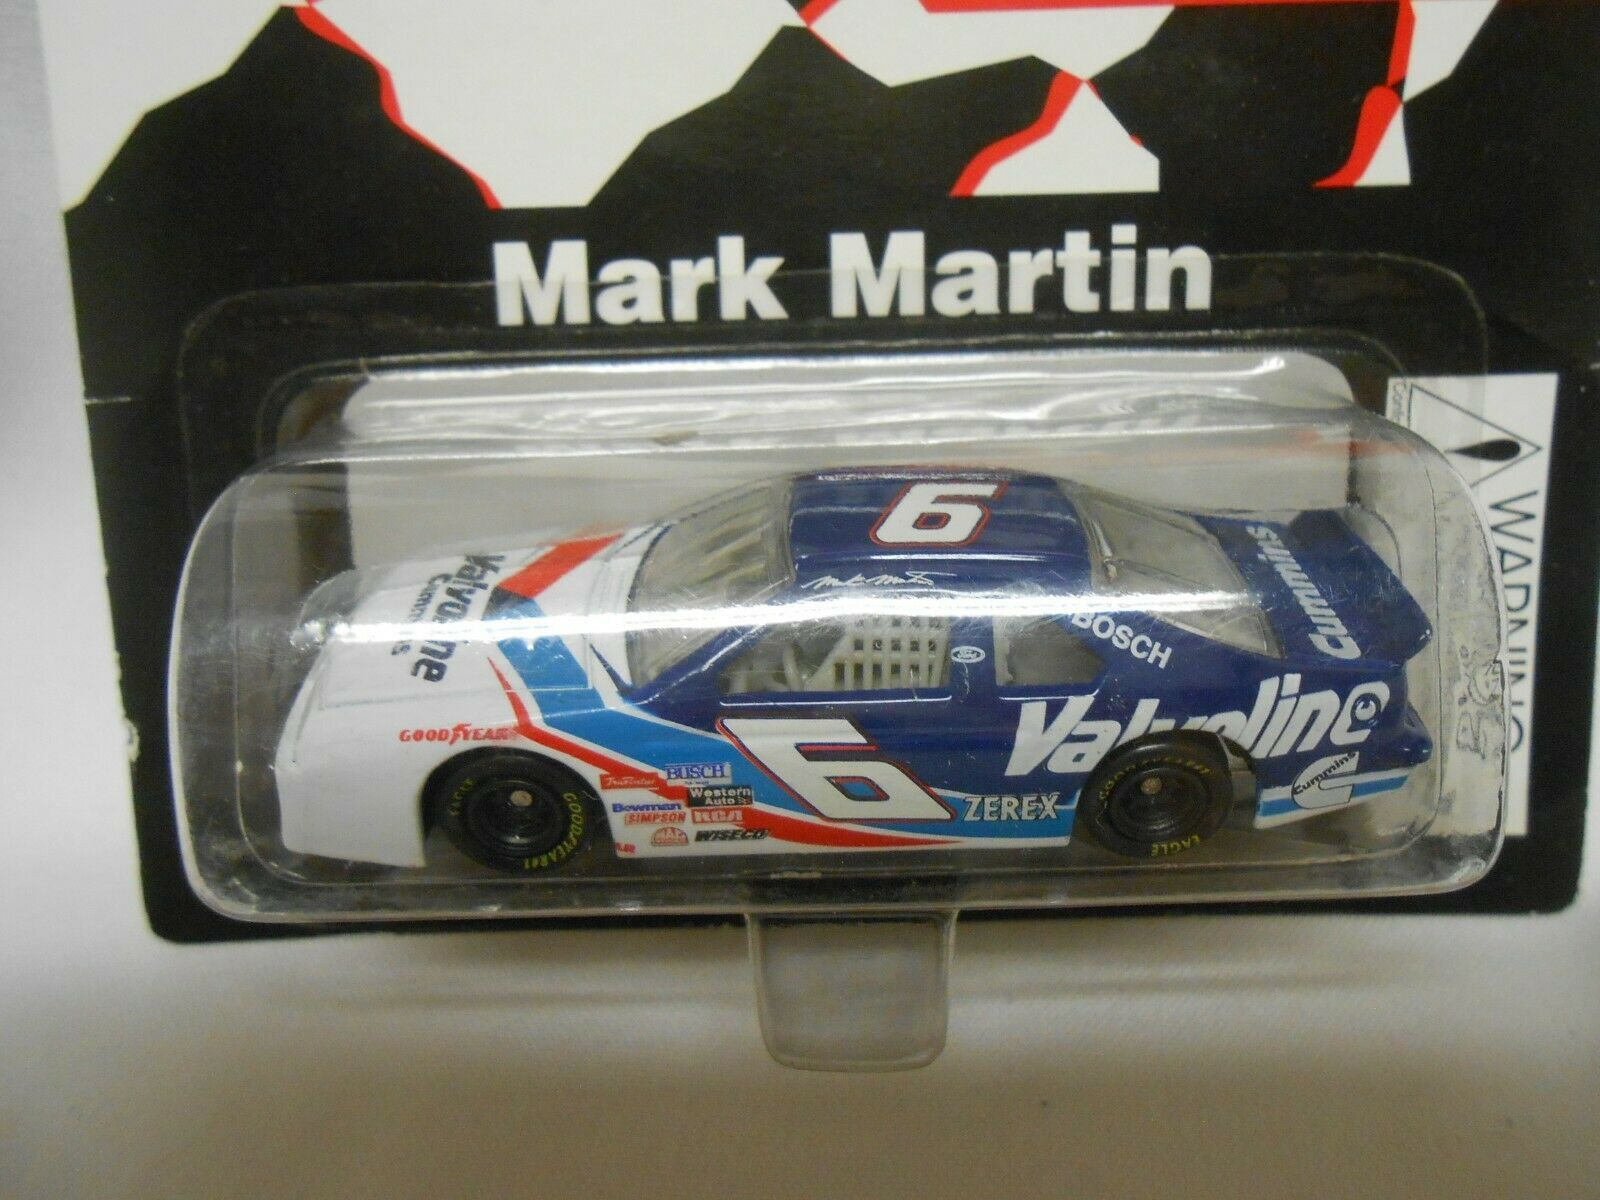 Vintage Revell Racing 1/64 1996 Edition Mark Martin Valvoline Die Cast Car NIP - $8.90